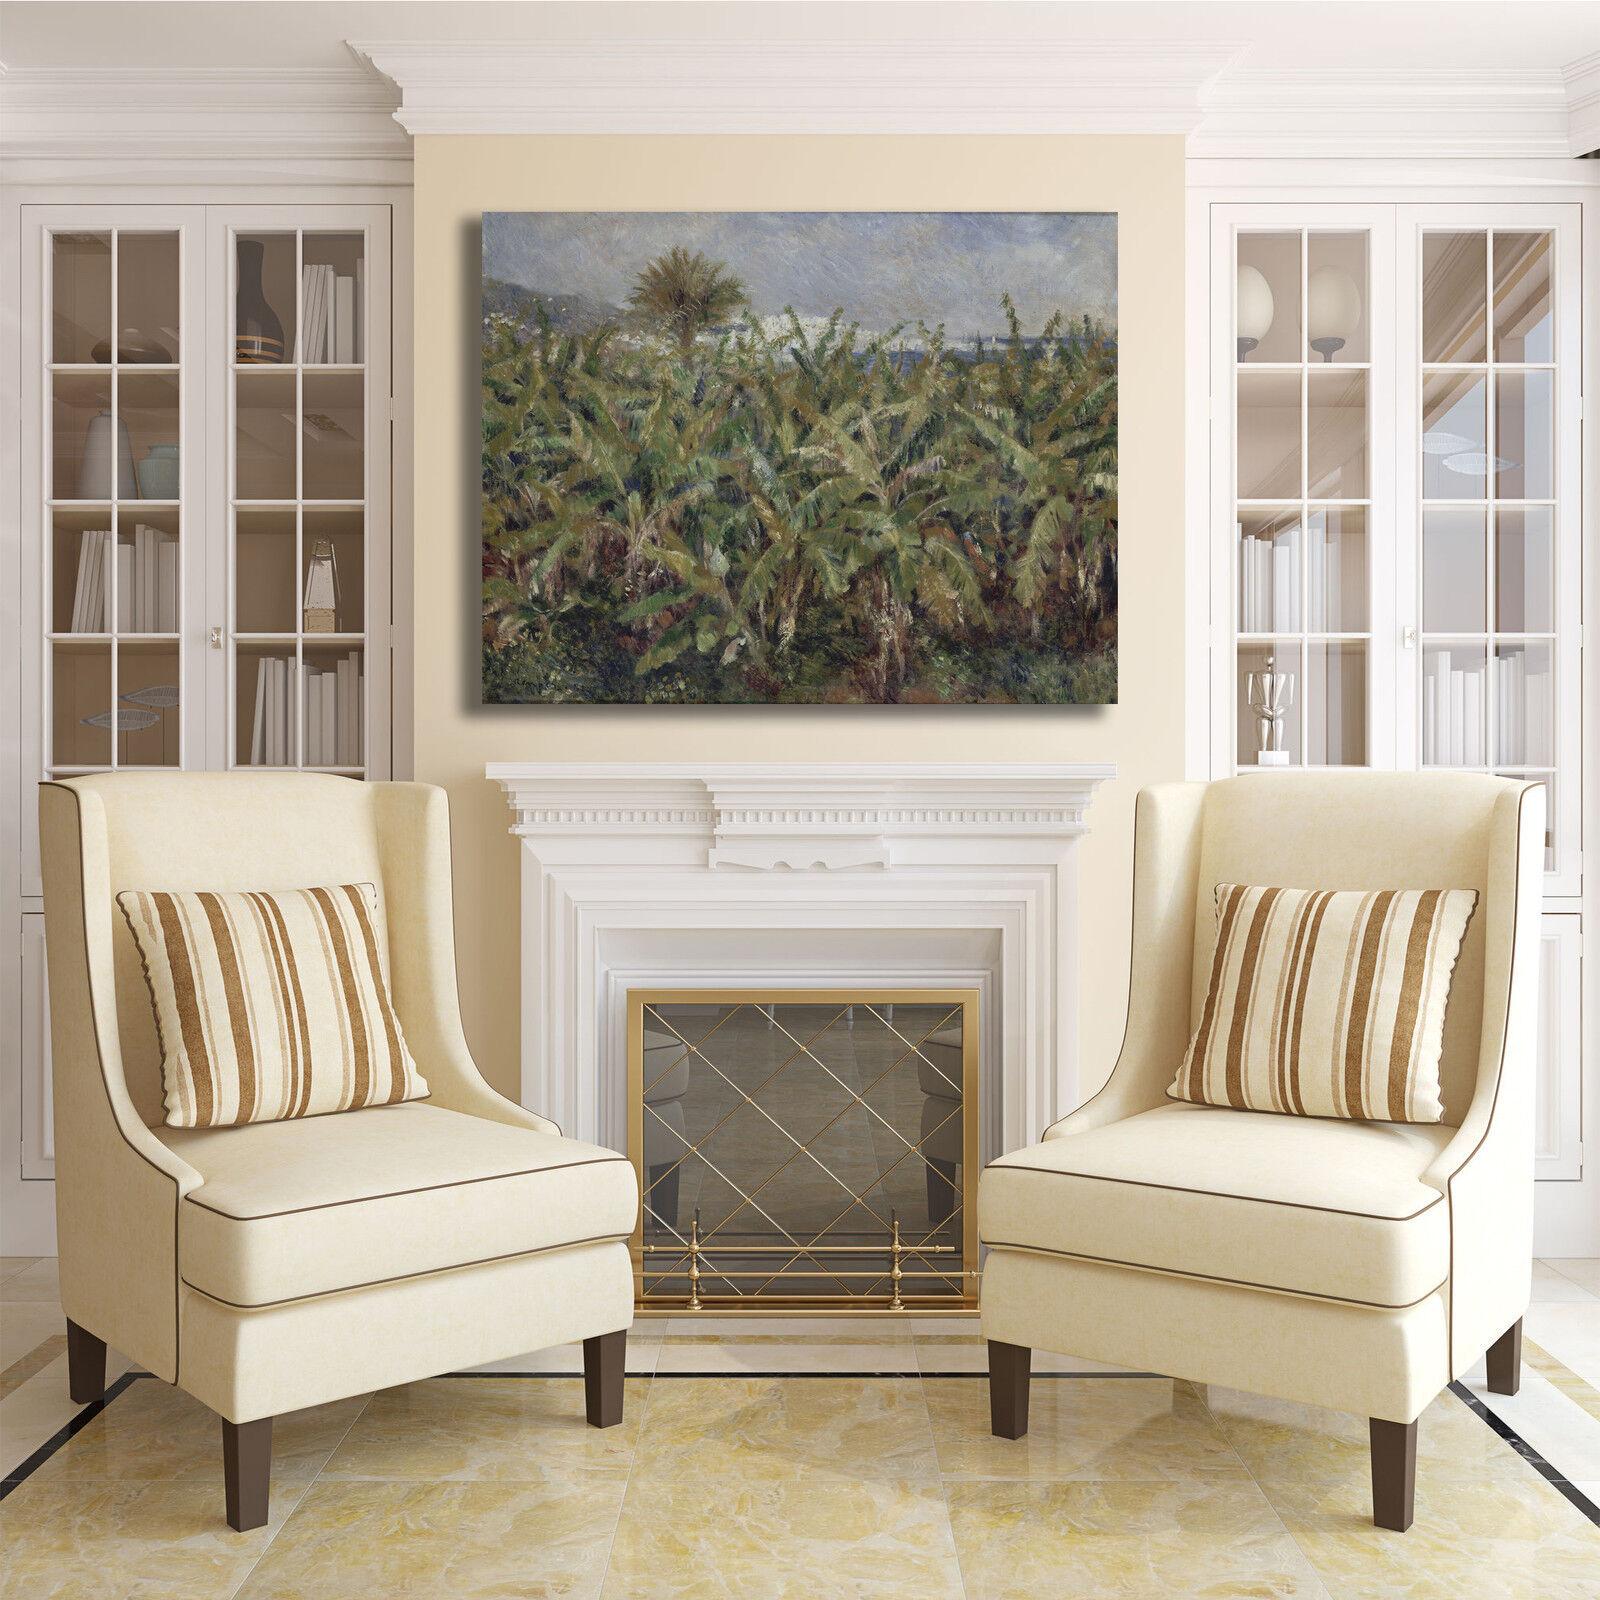 Renoir di campo di Renoir banani design quadro stampa tela dipinto telaio arRouge o casa 308889